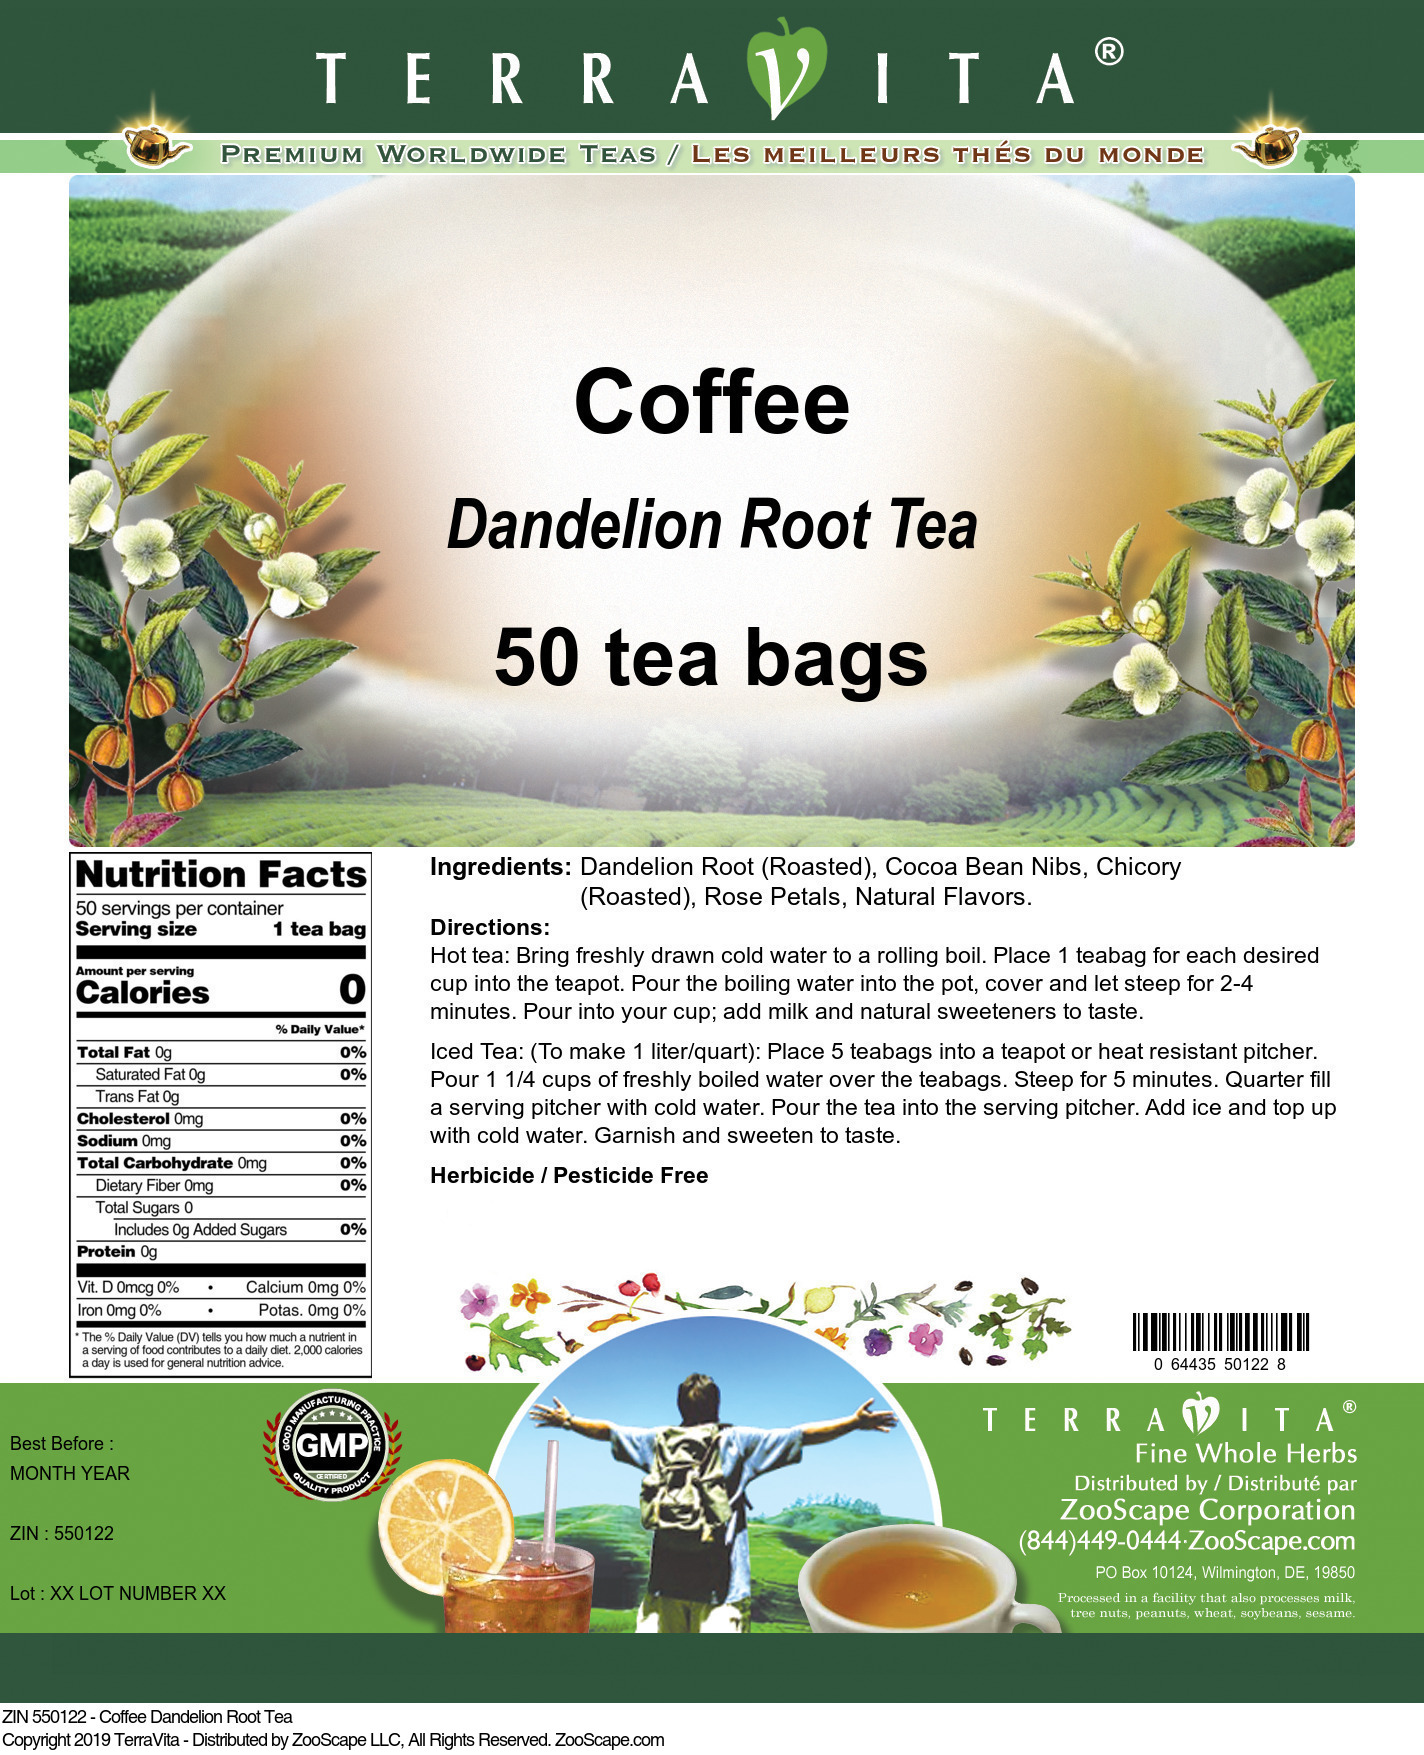 Coffee Dandelion Root Tea